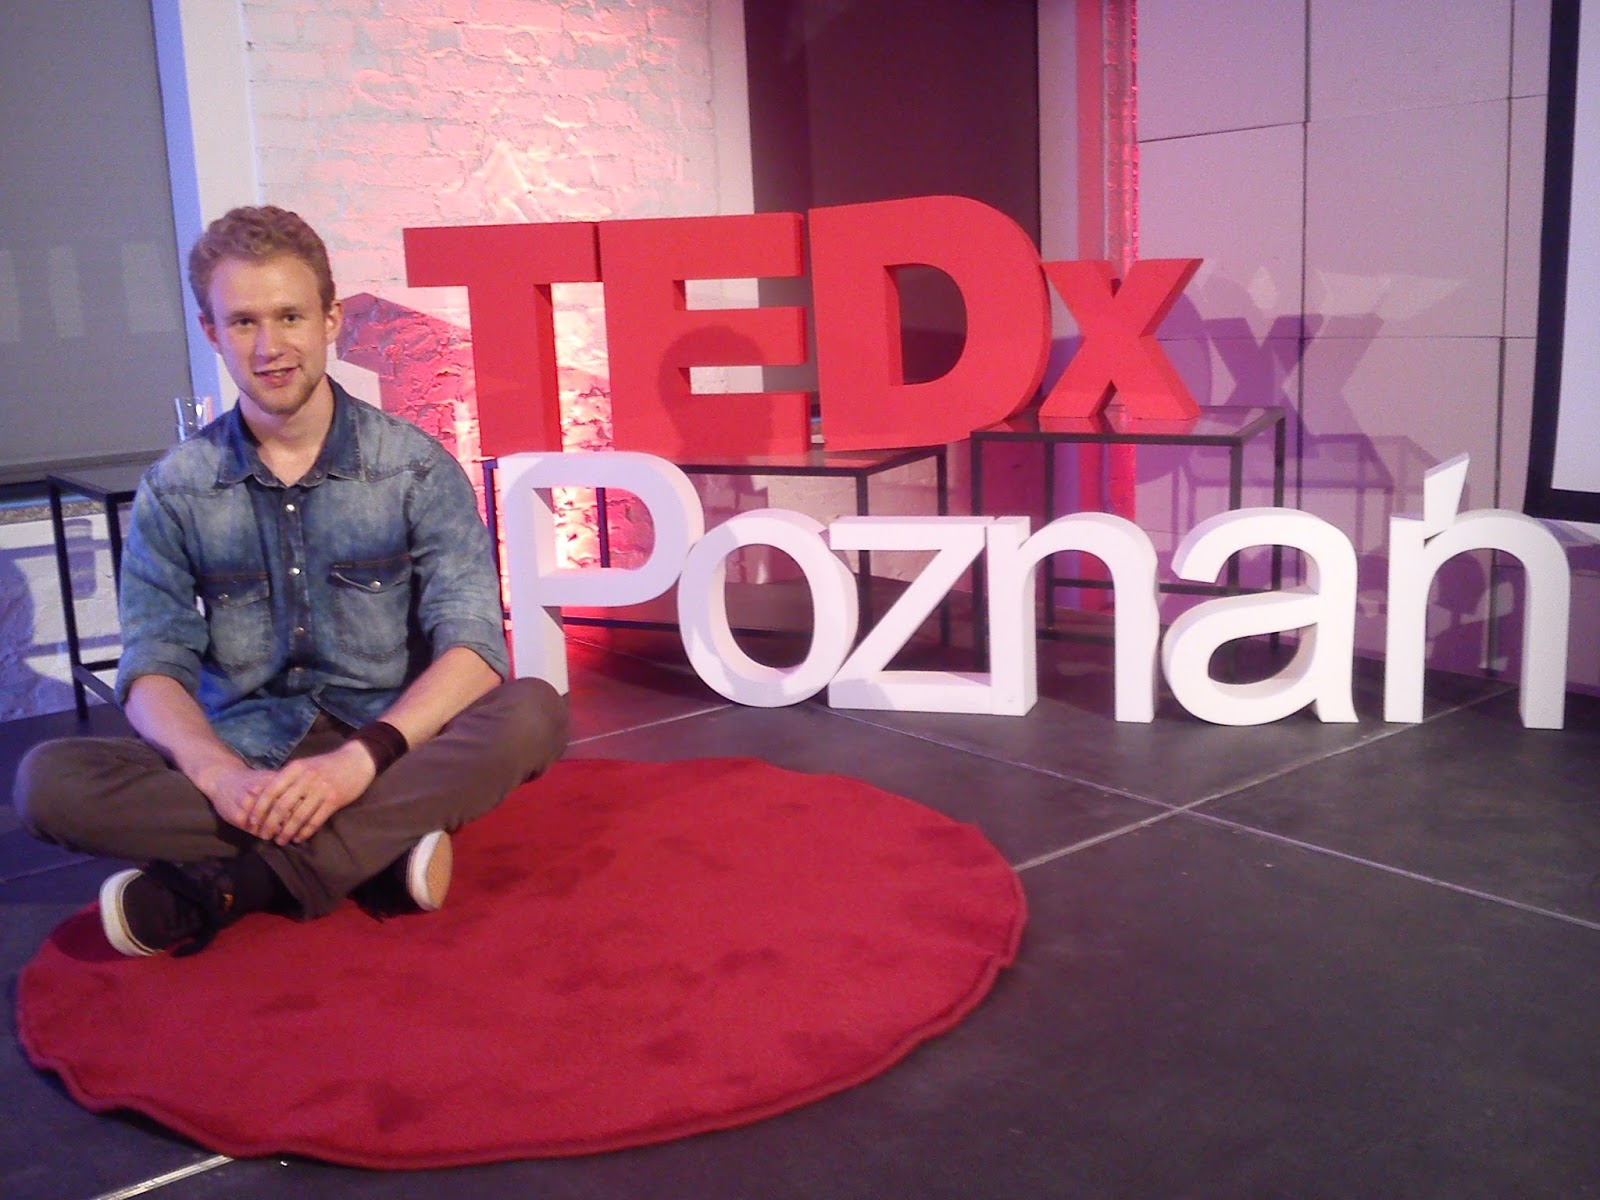 TEDxPoznan